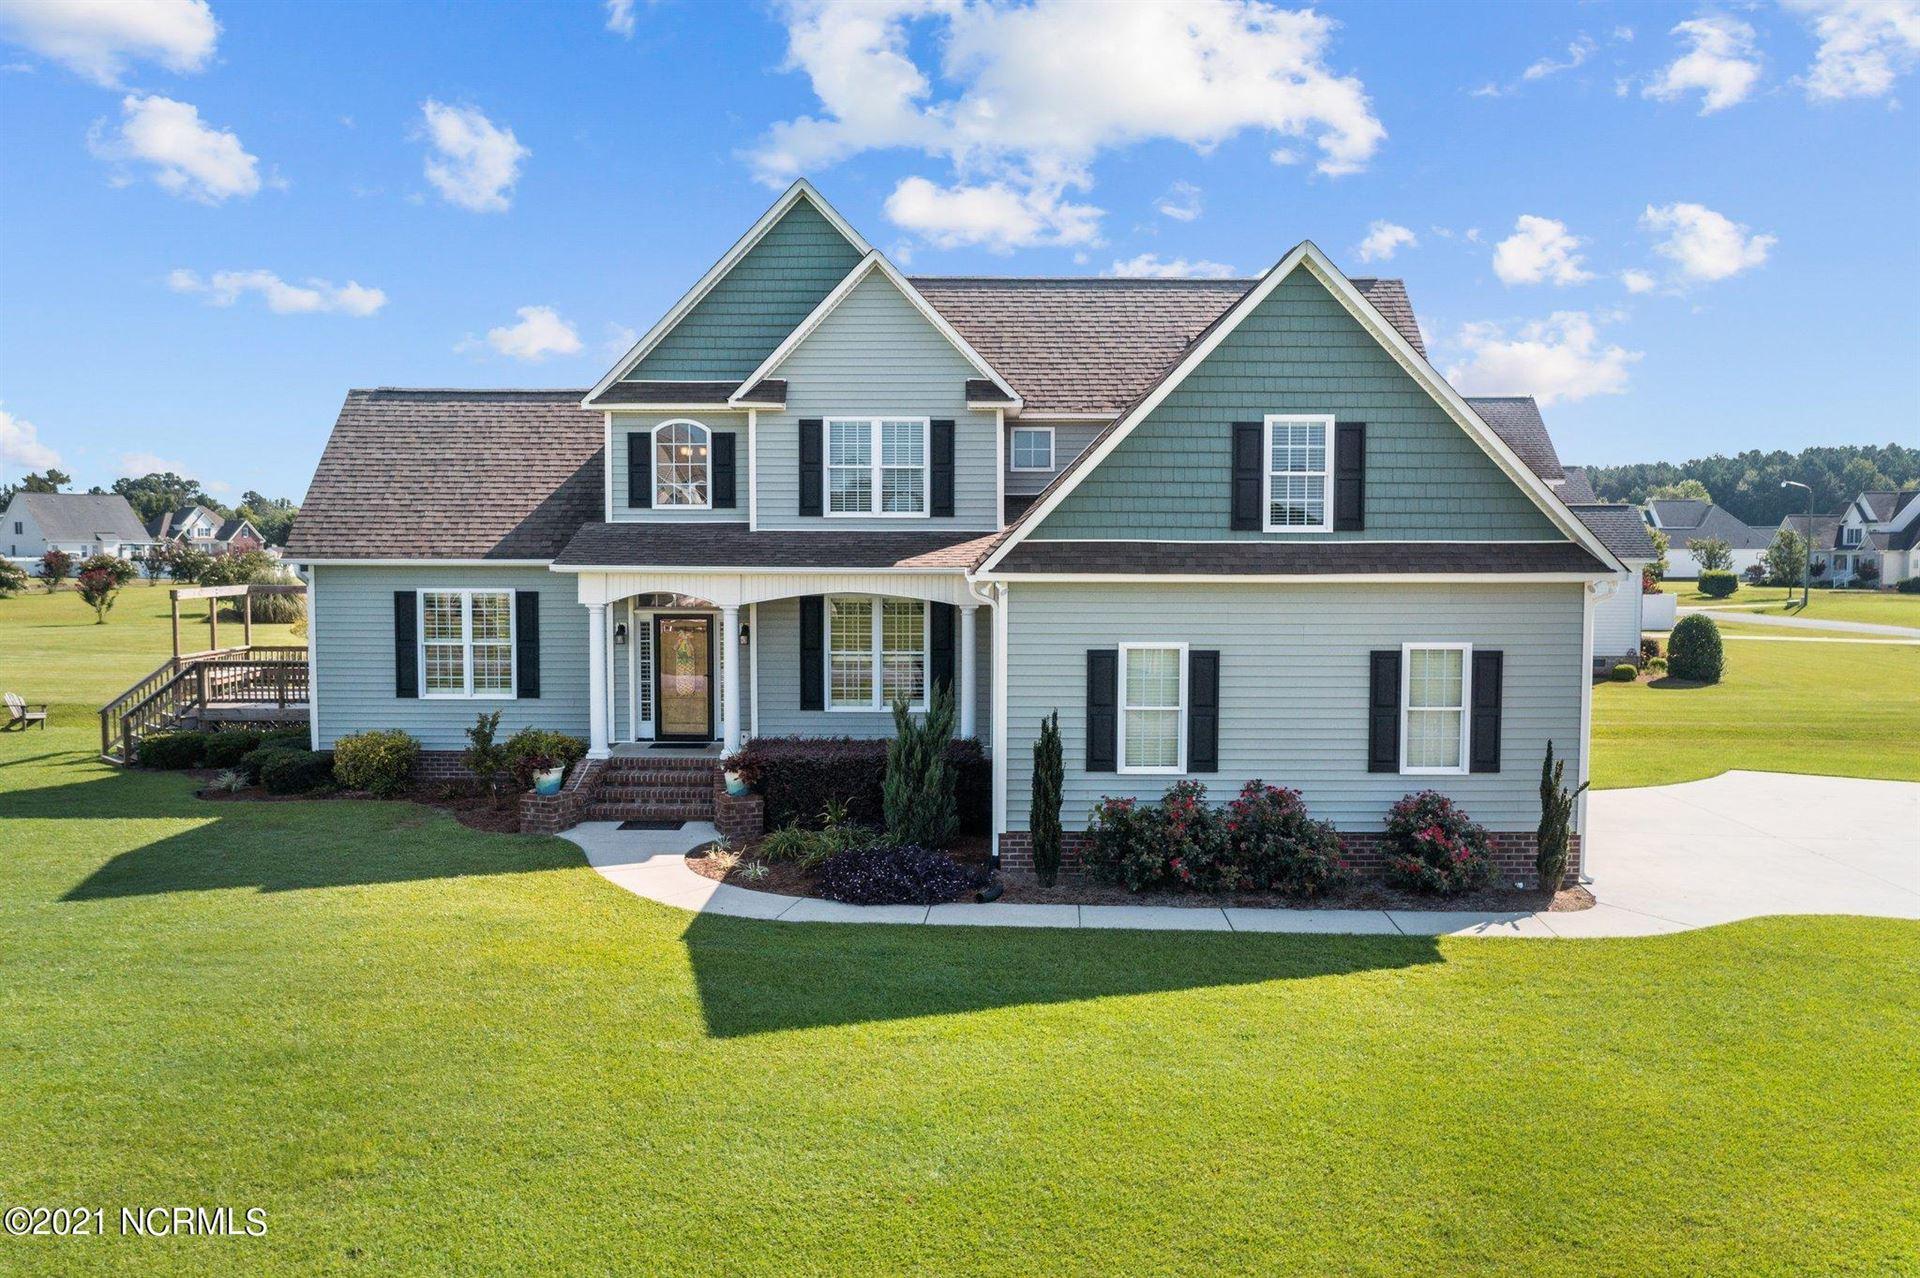 Photo of 2373 Wheaton Village Drive, Greenville, NC 27858 (MLS # 100286704)